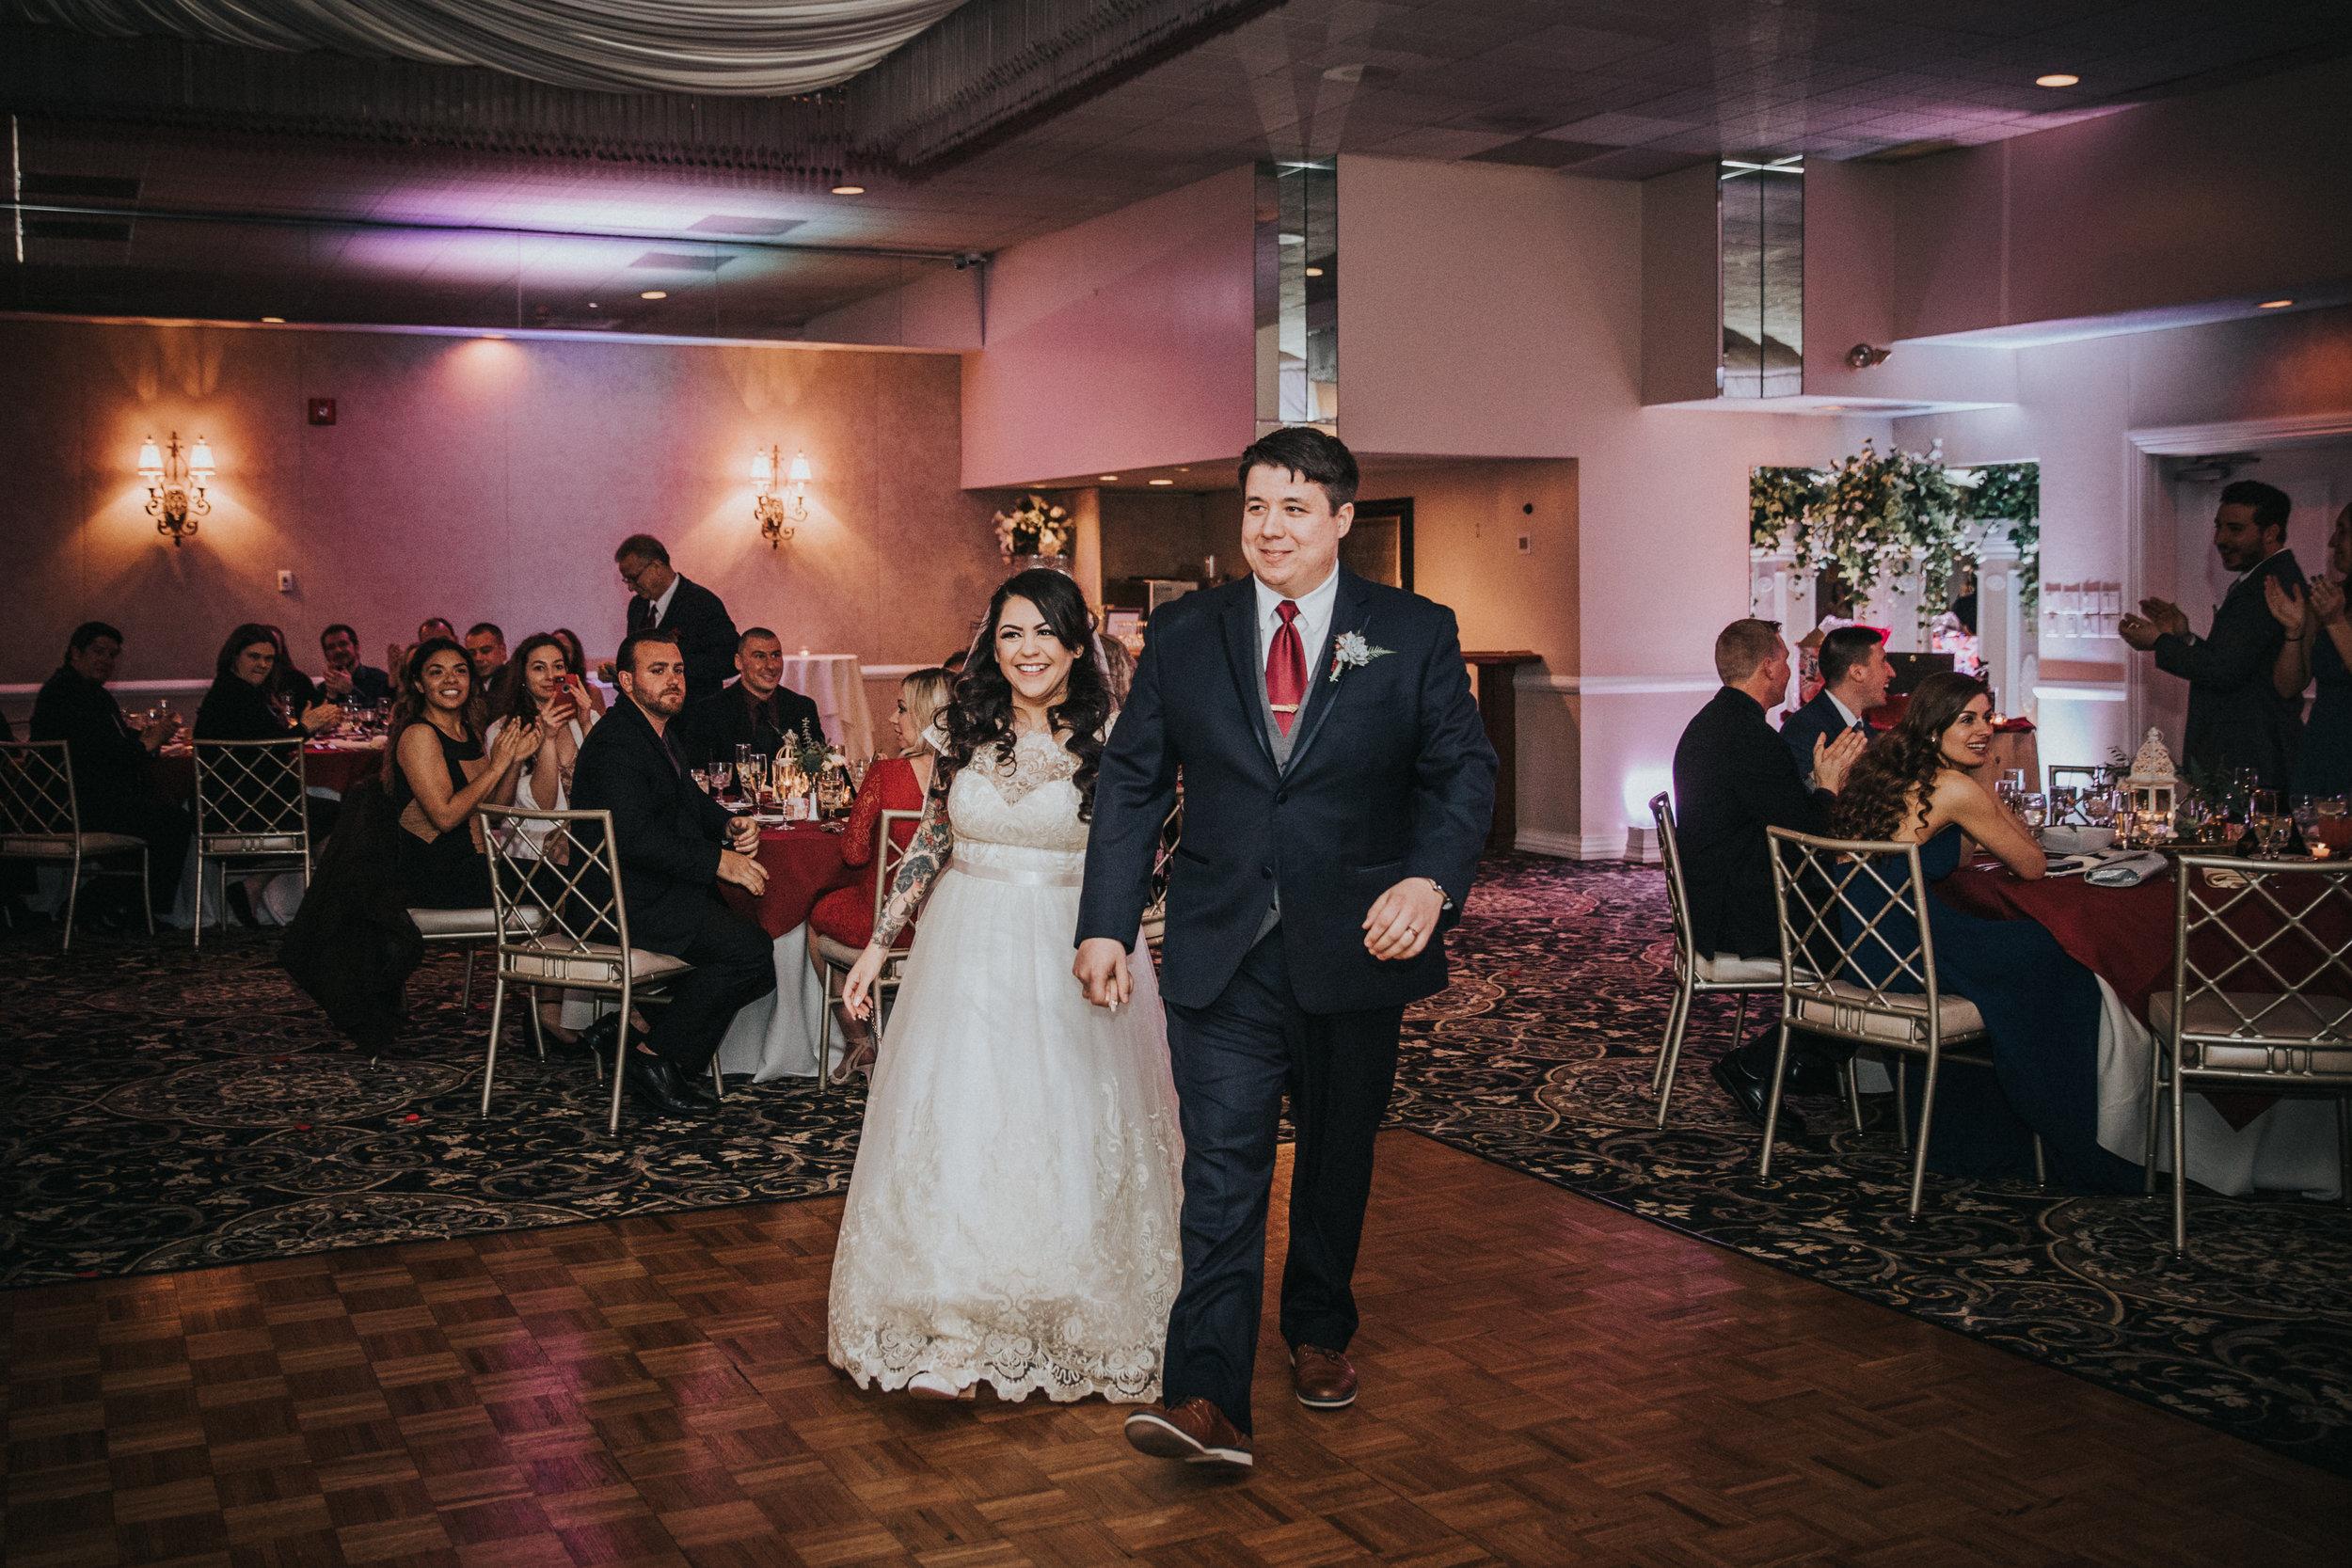 New-Jersey-Wedding-Photographer-ReceptionCenter-Valeria&Mike-Reception (68 of 265).jpg